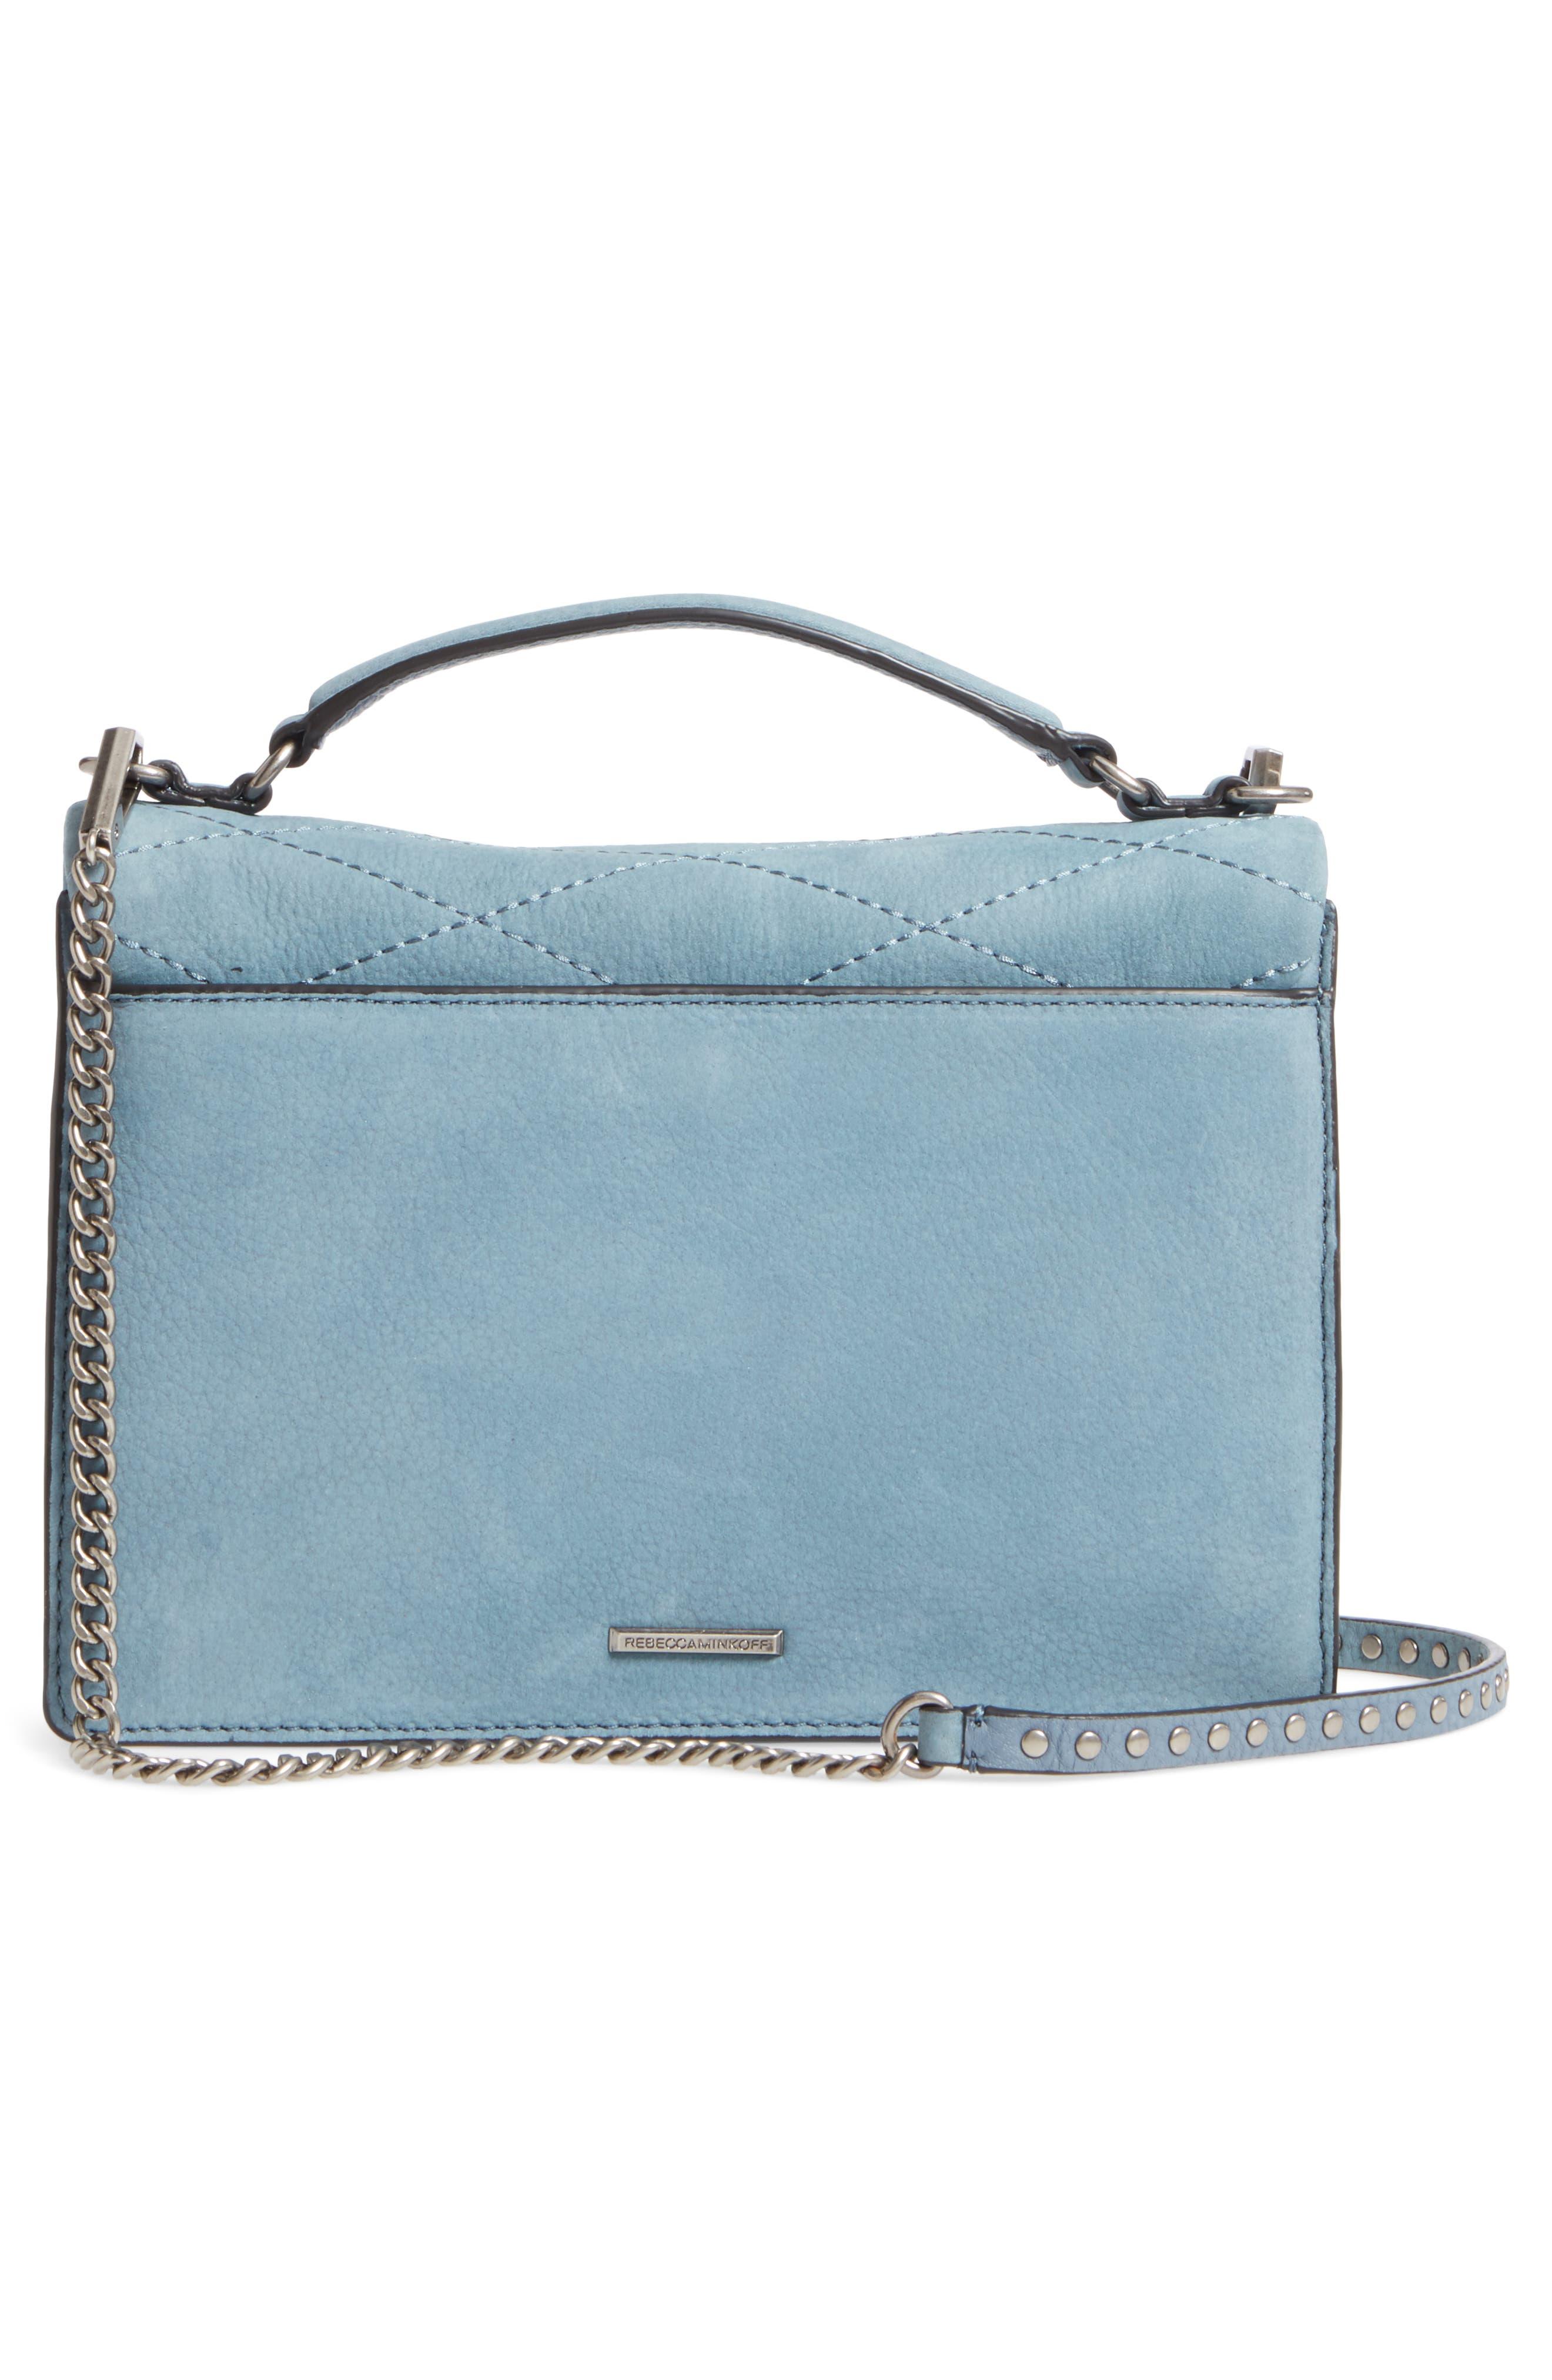 Medium Je T'aime Convertible Leather Crossbody Bag,                             Alternate thumbnail 25, color,